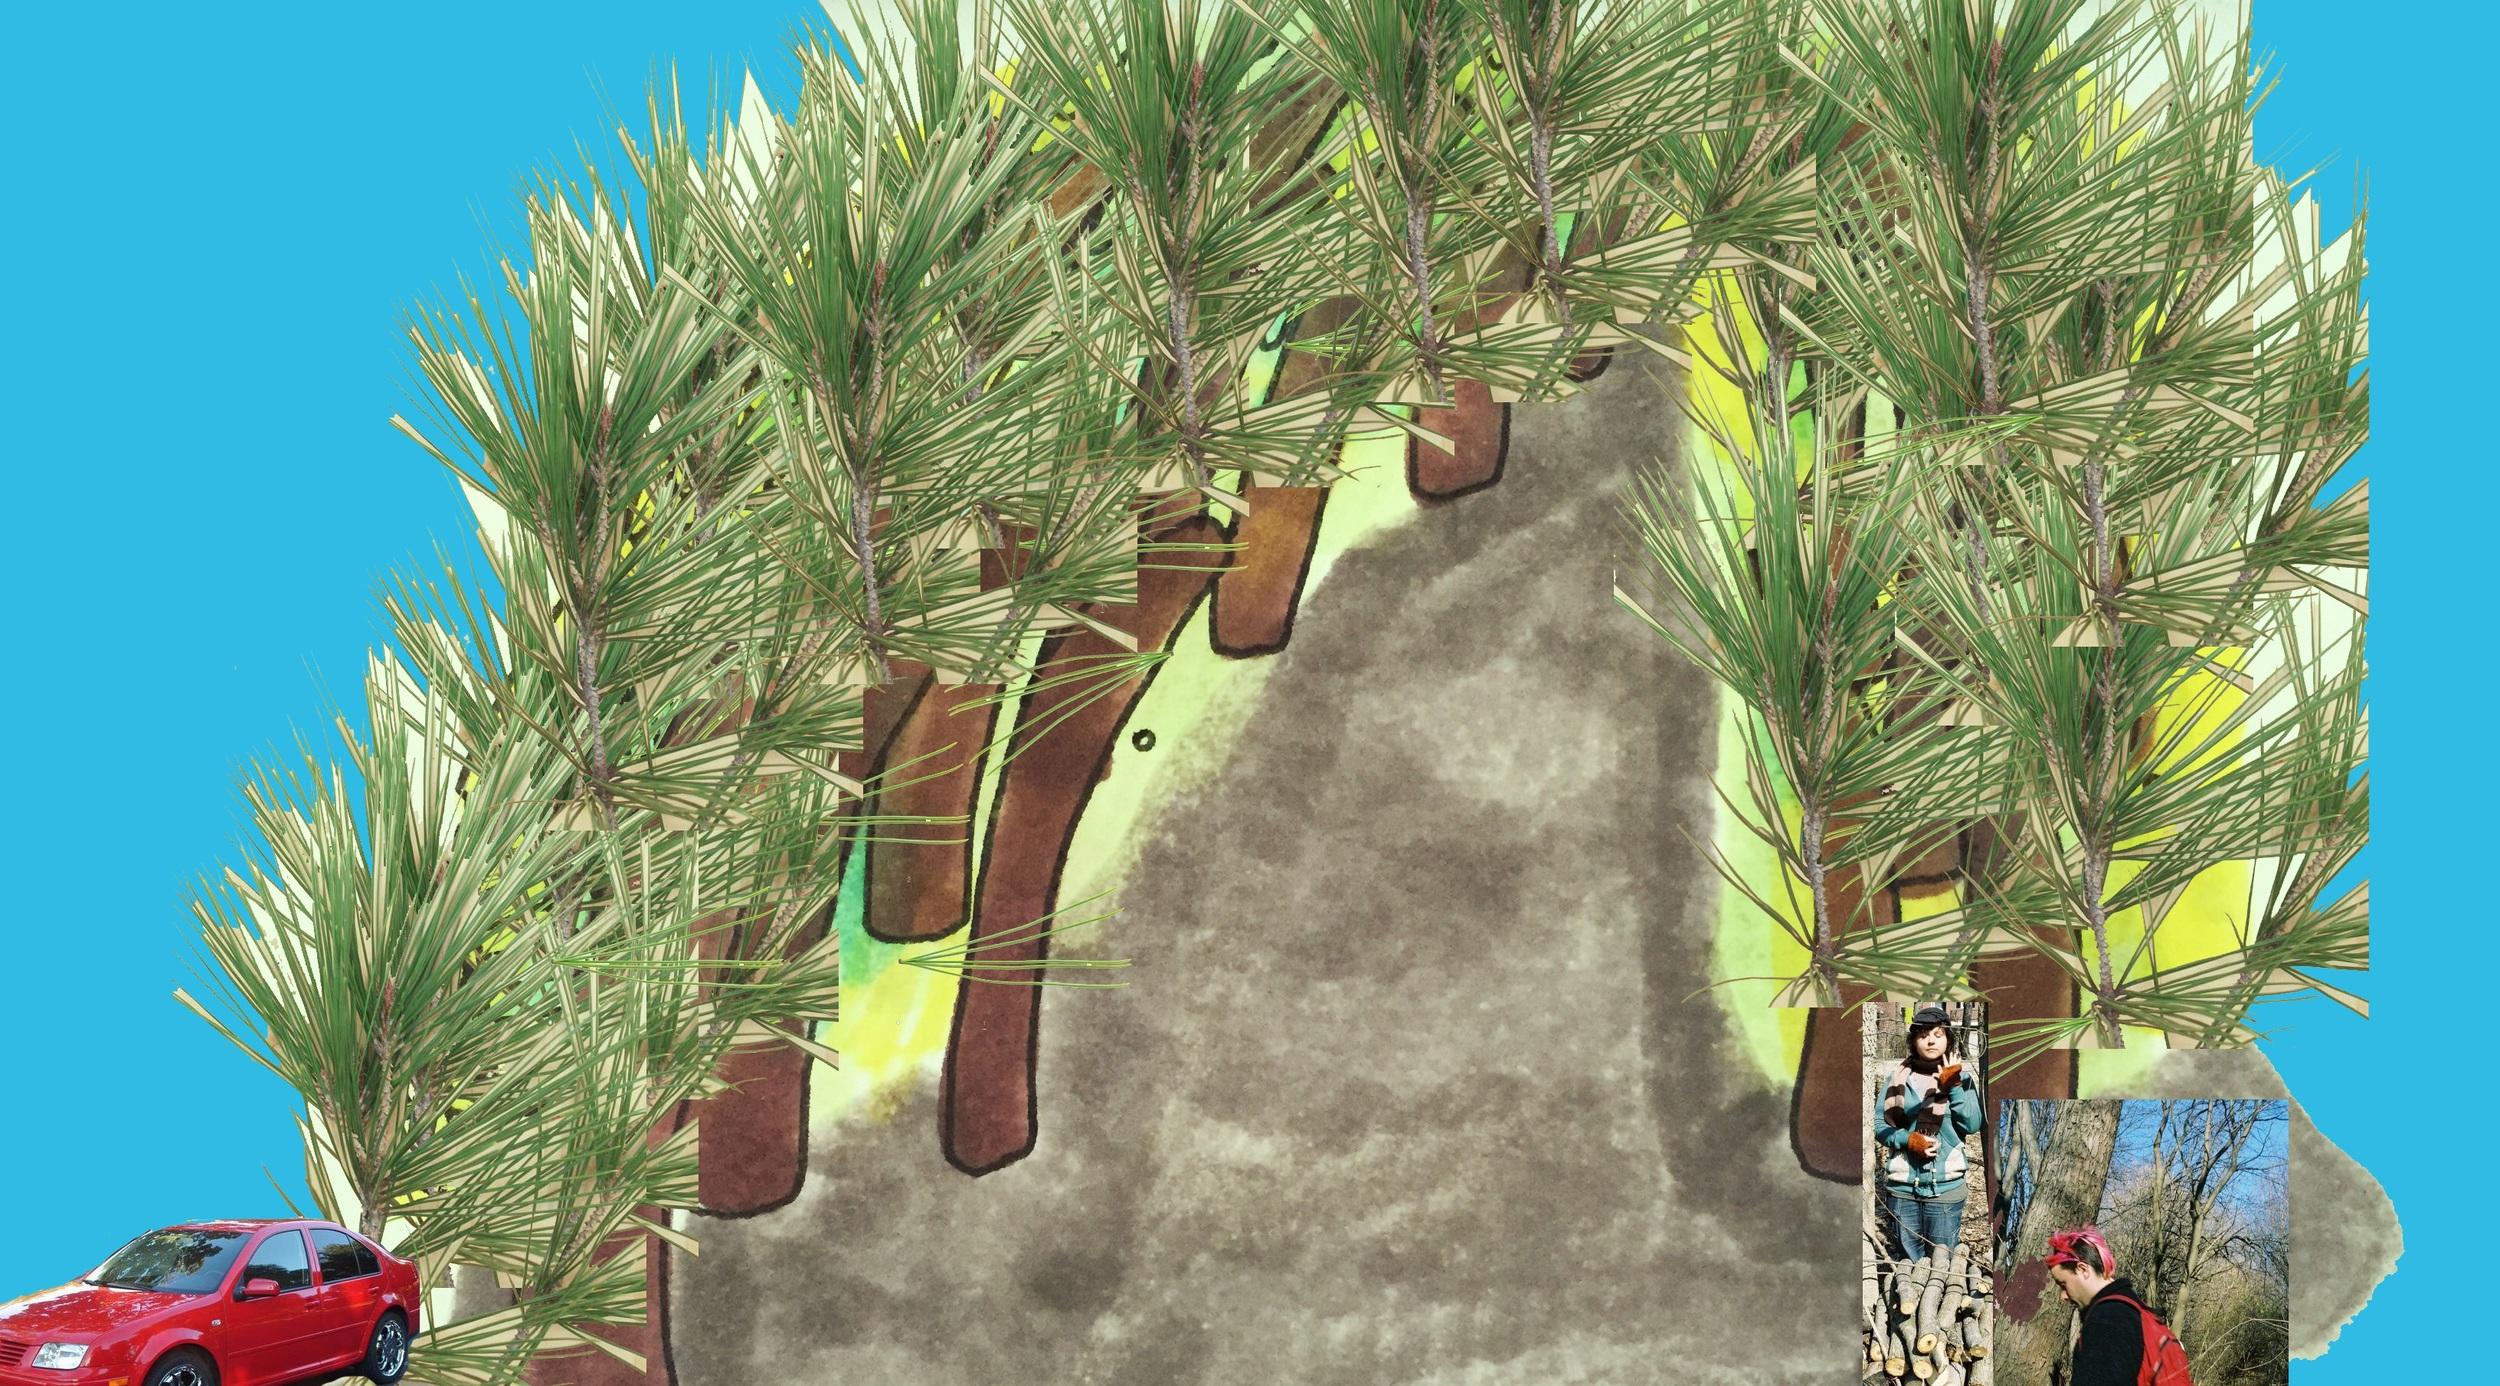 Pitch pine @ Pine Grove Preserve